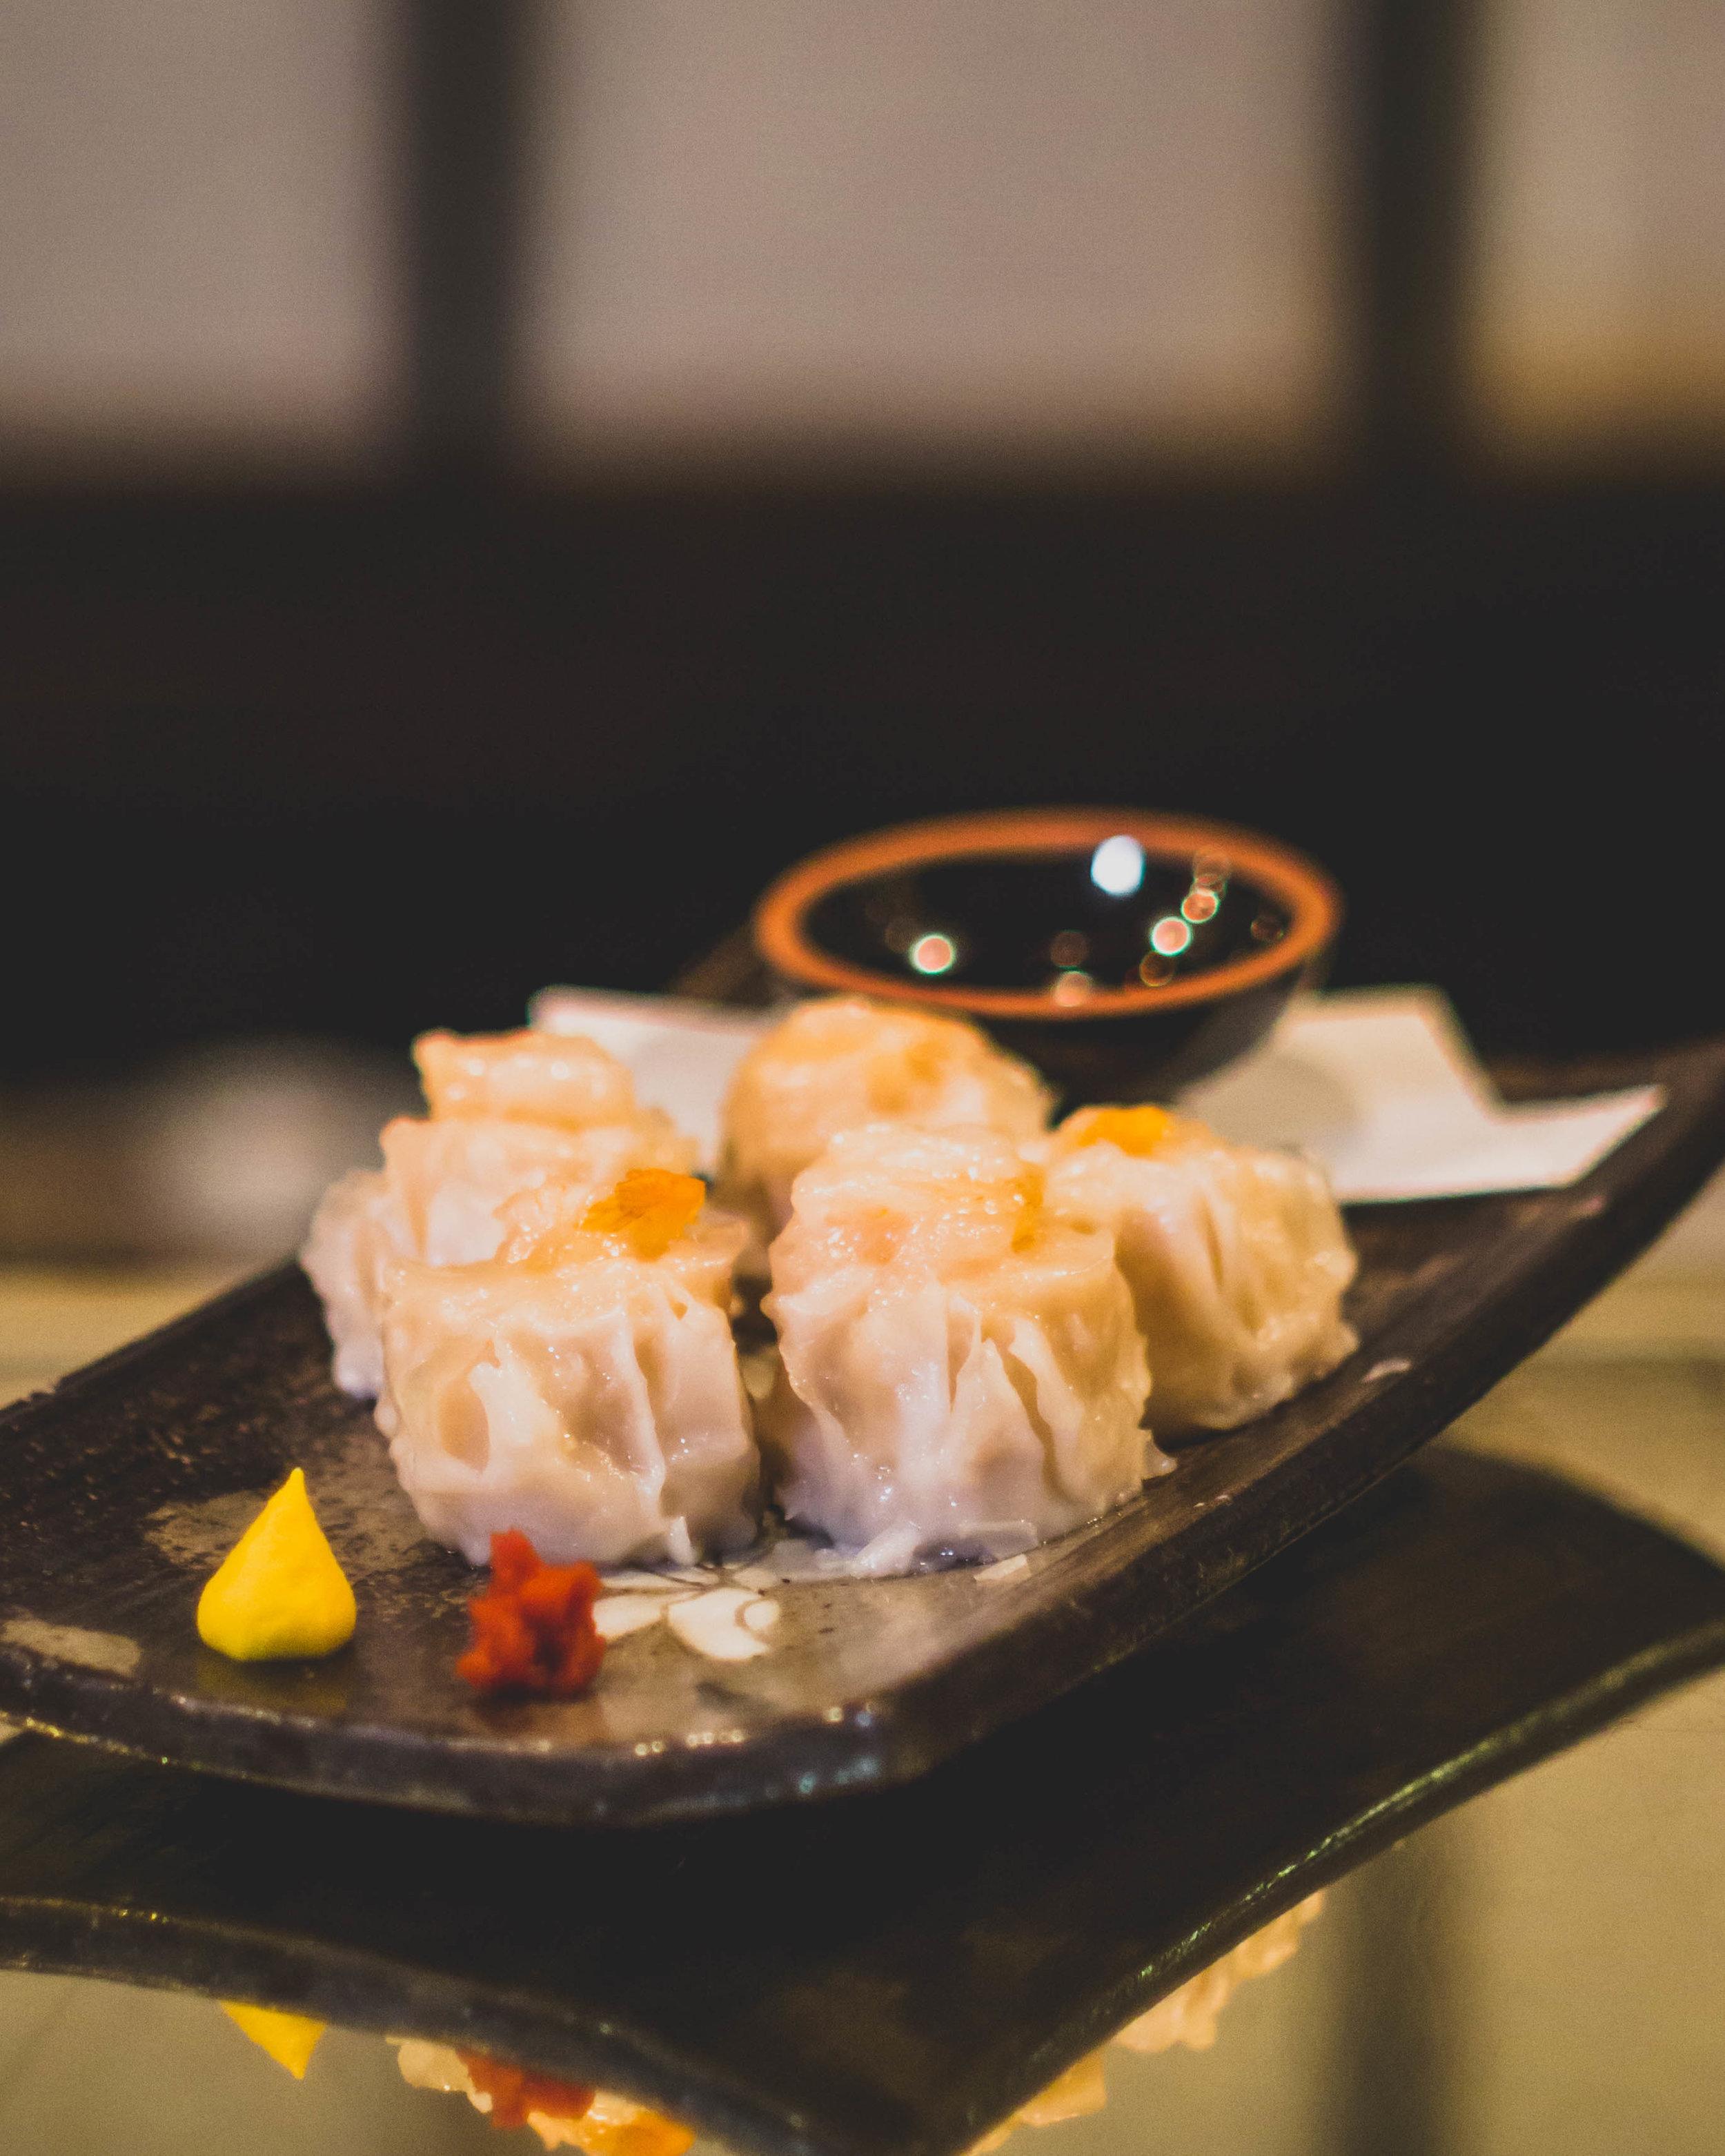 EBI SHUMAI* - Steamed shrimp shumai dumplings